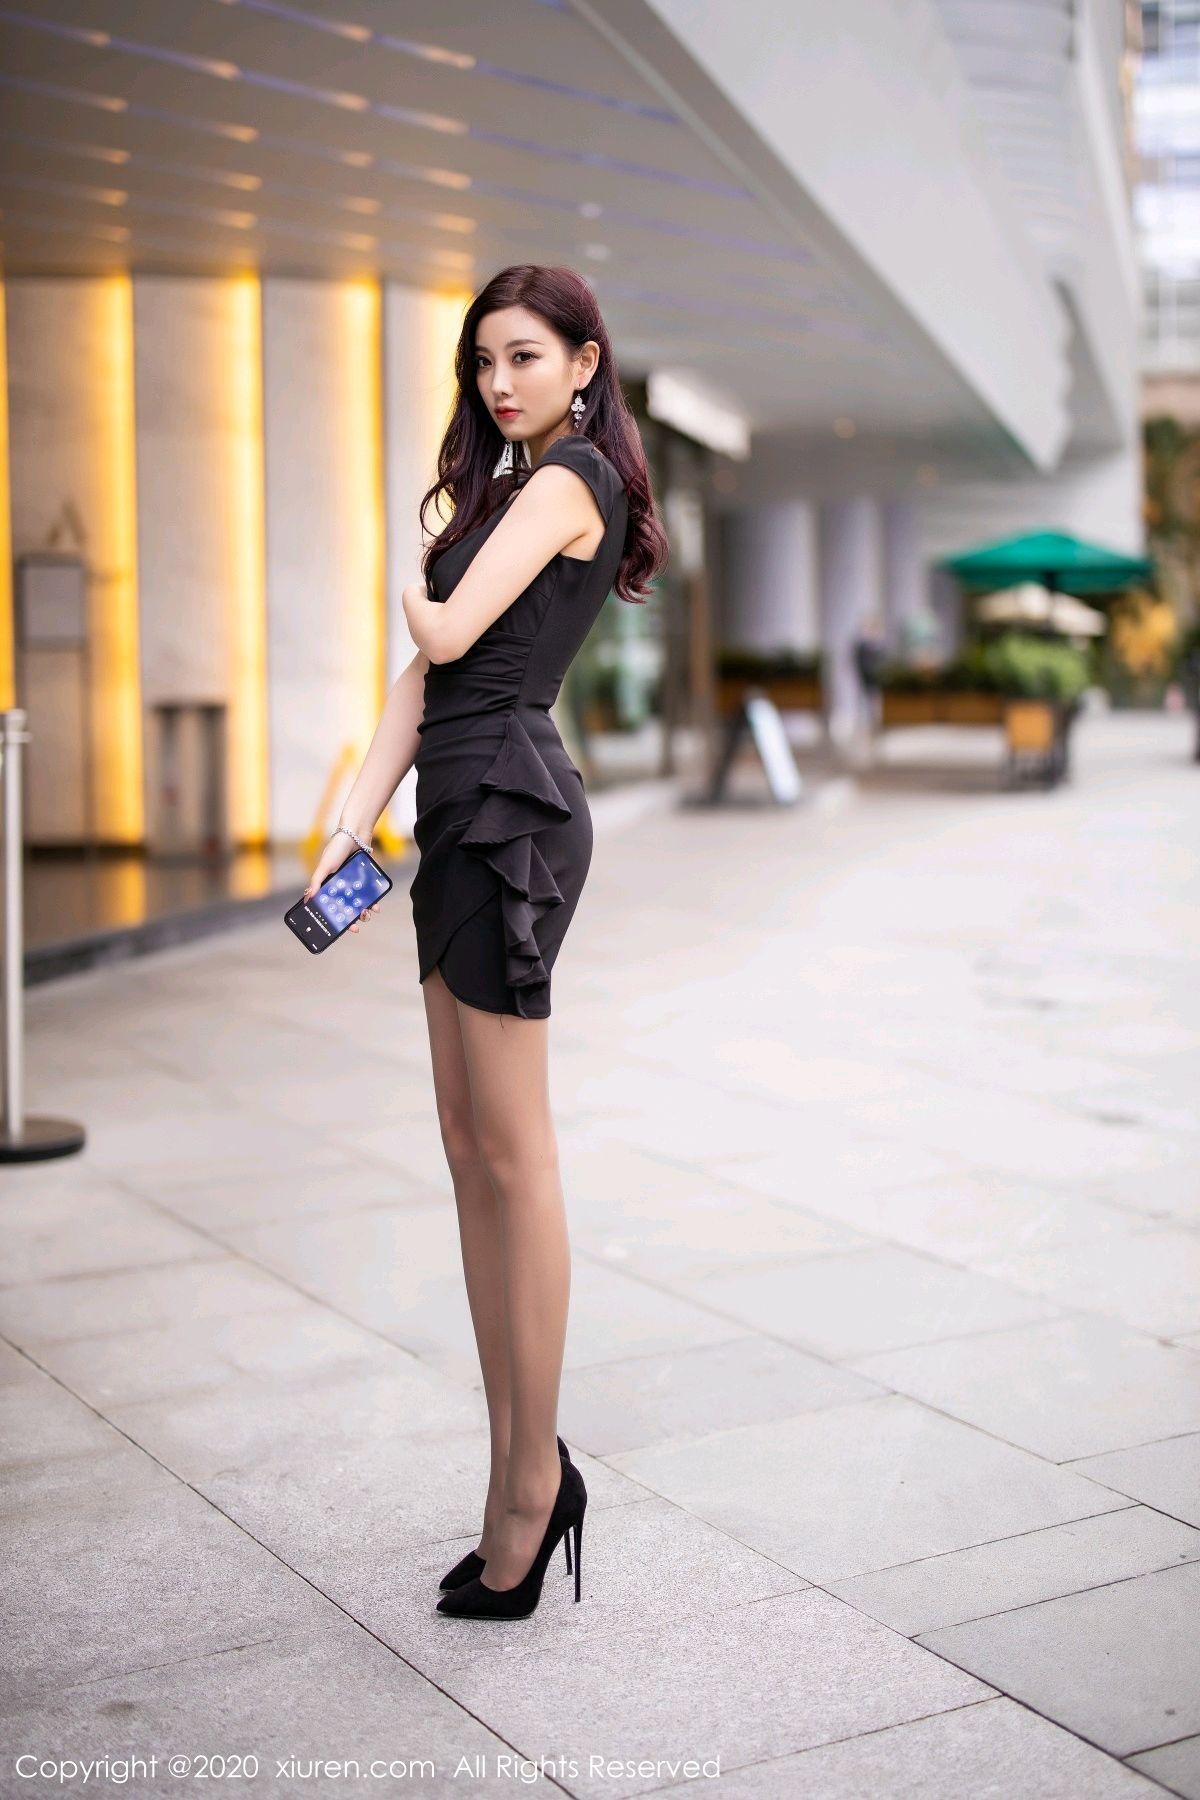 [XiuRen] Vol.2241 Yang Chen Chen 41P, Underwear, Xiuren, Yang Chen Chen